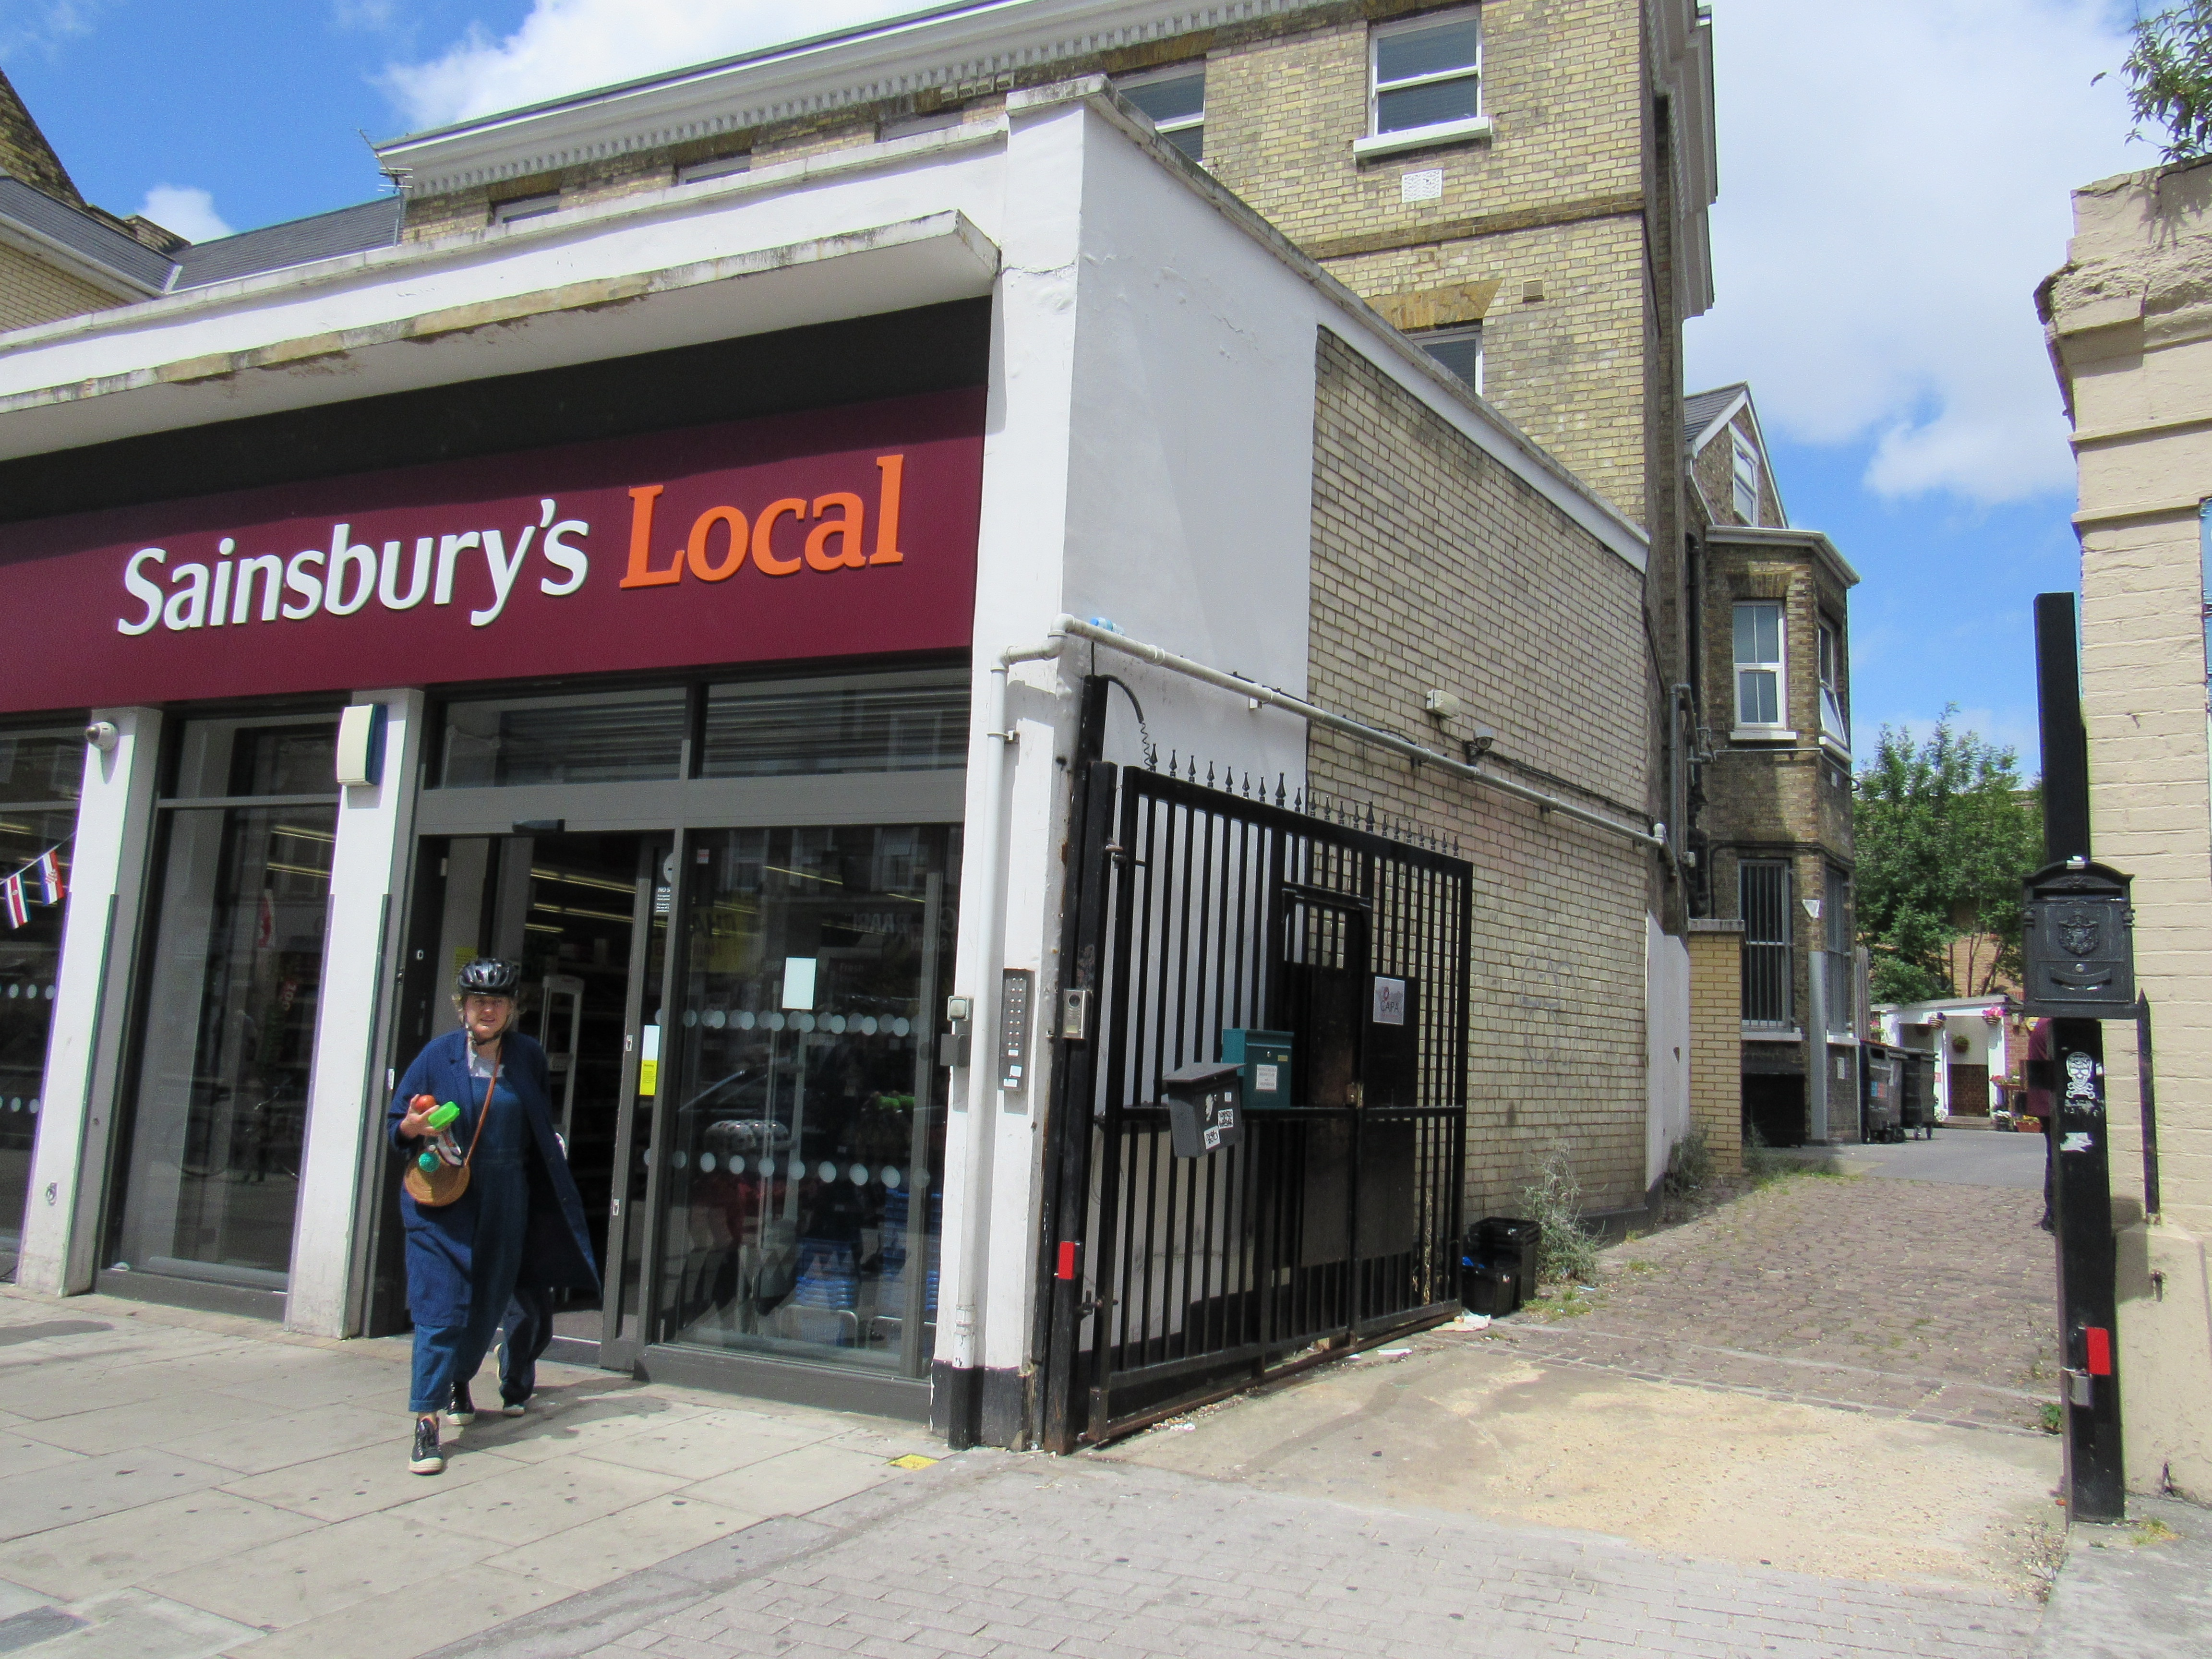 Sainsbury's Local in Goldhawk